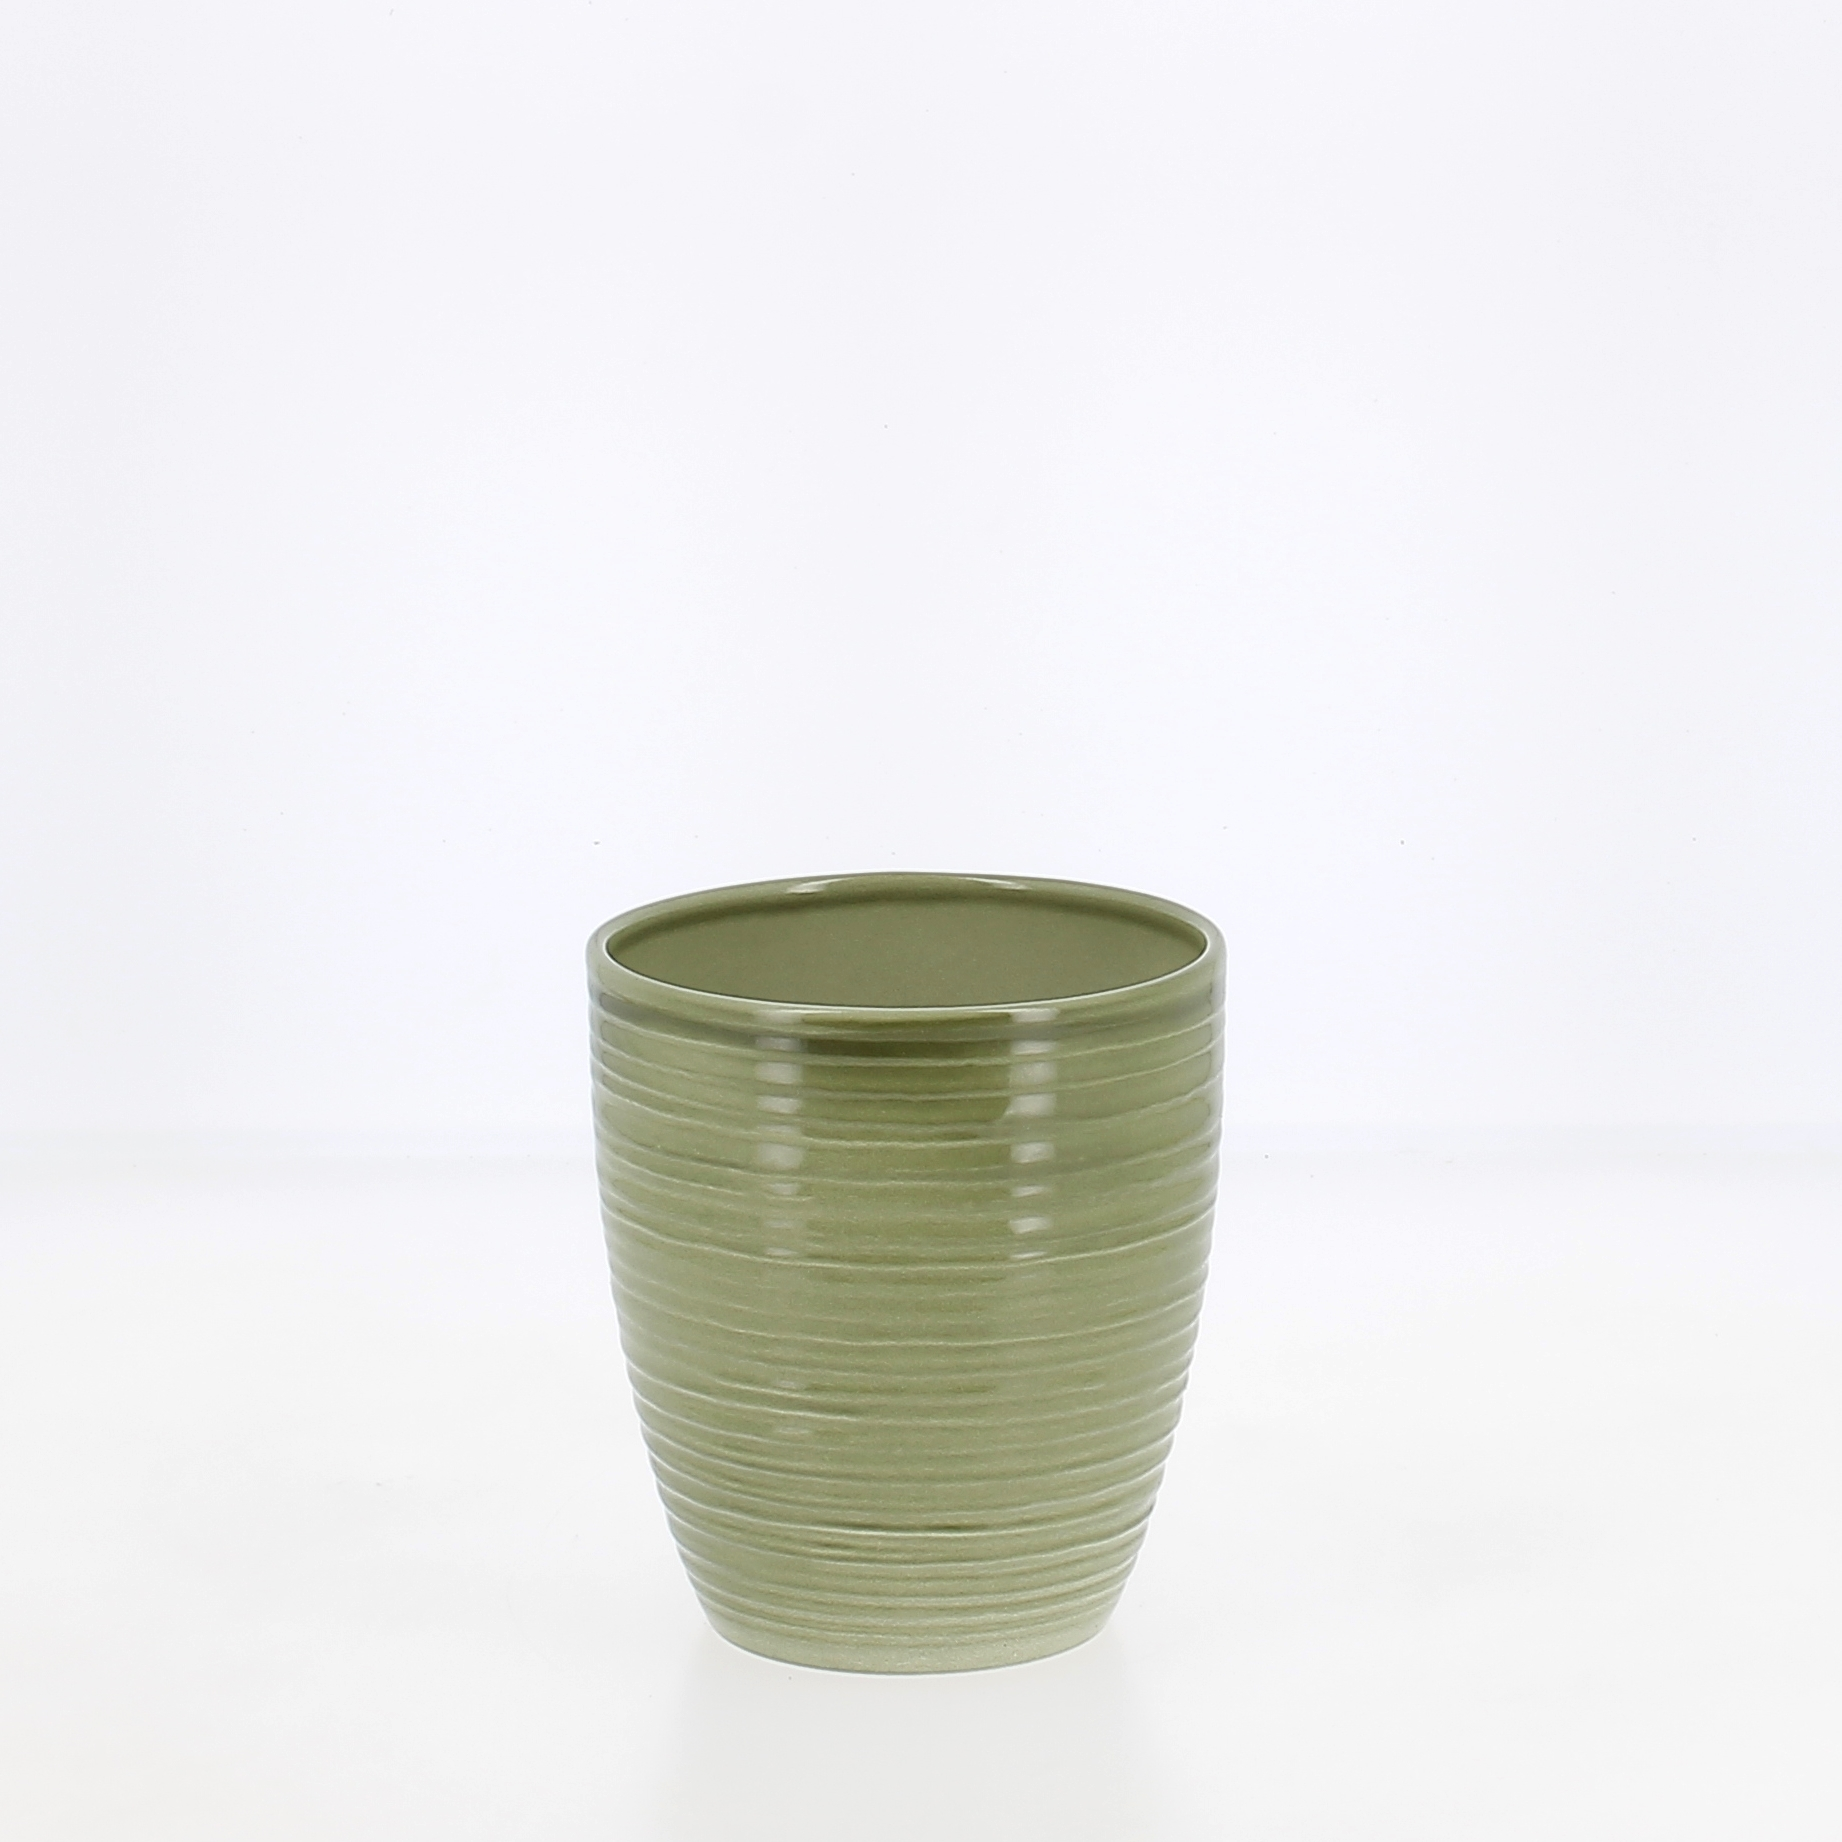 vaso-glass-olive